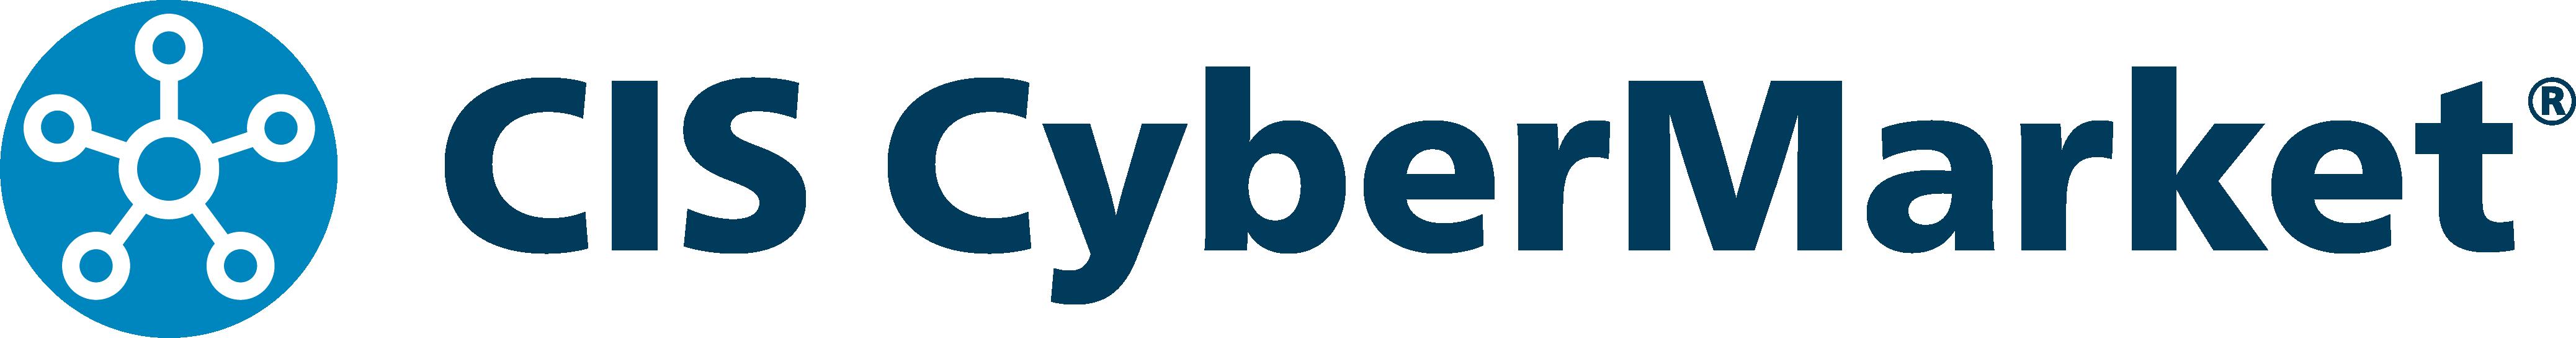 The CIS CyberMarket